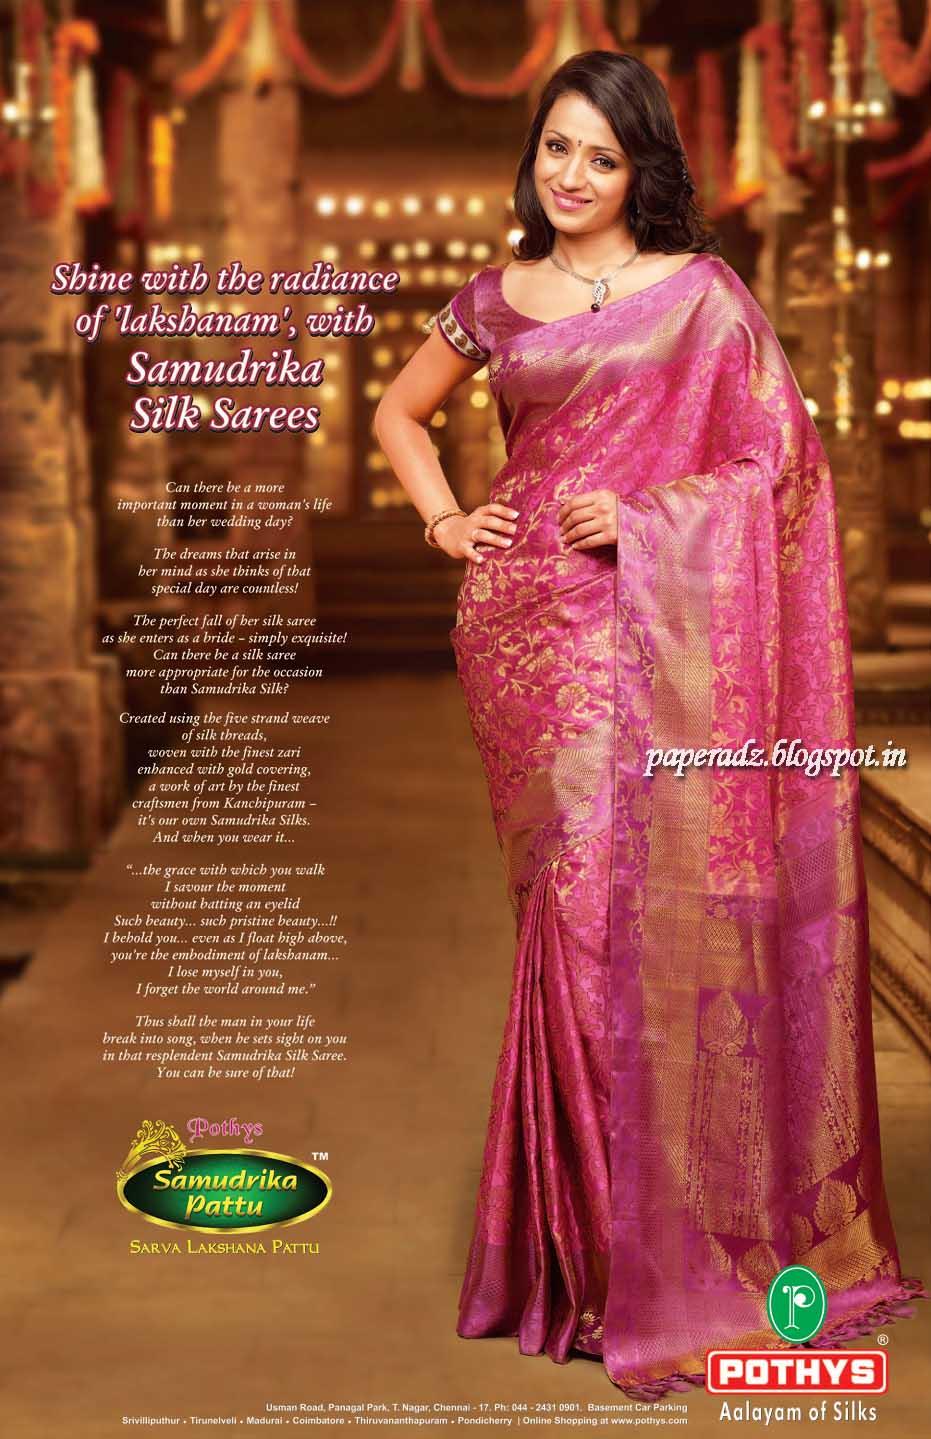 Pothys Aadi Sale 2012 Trisha Samudrika Pattu